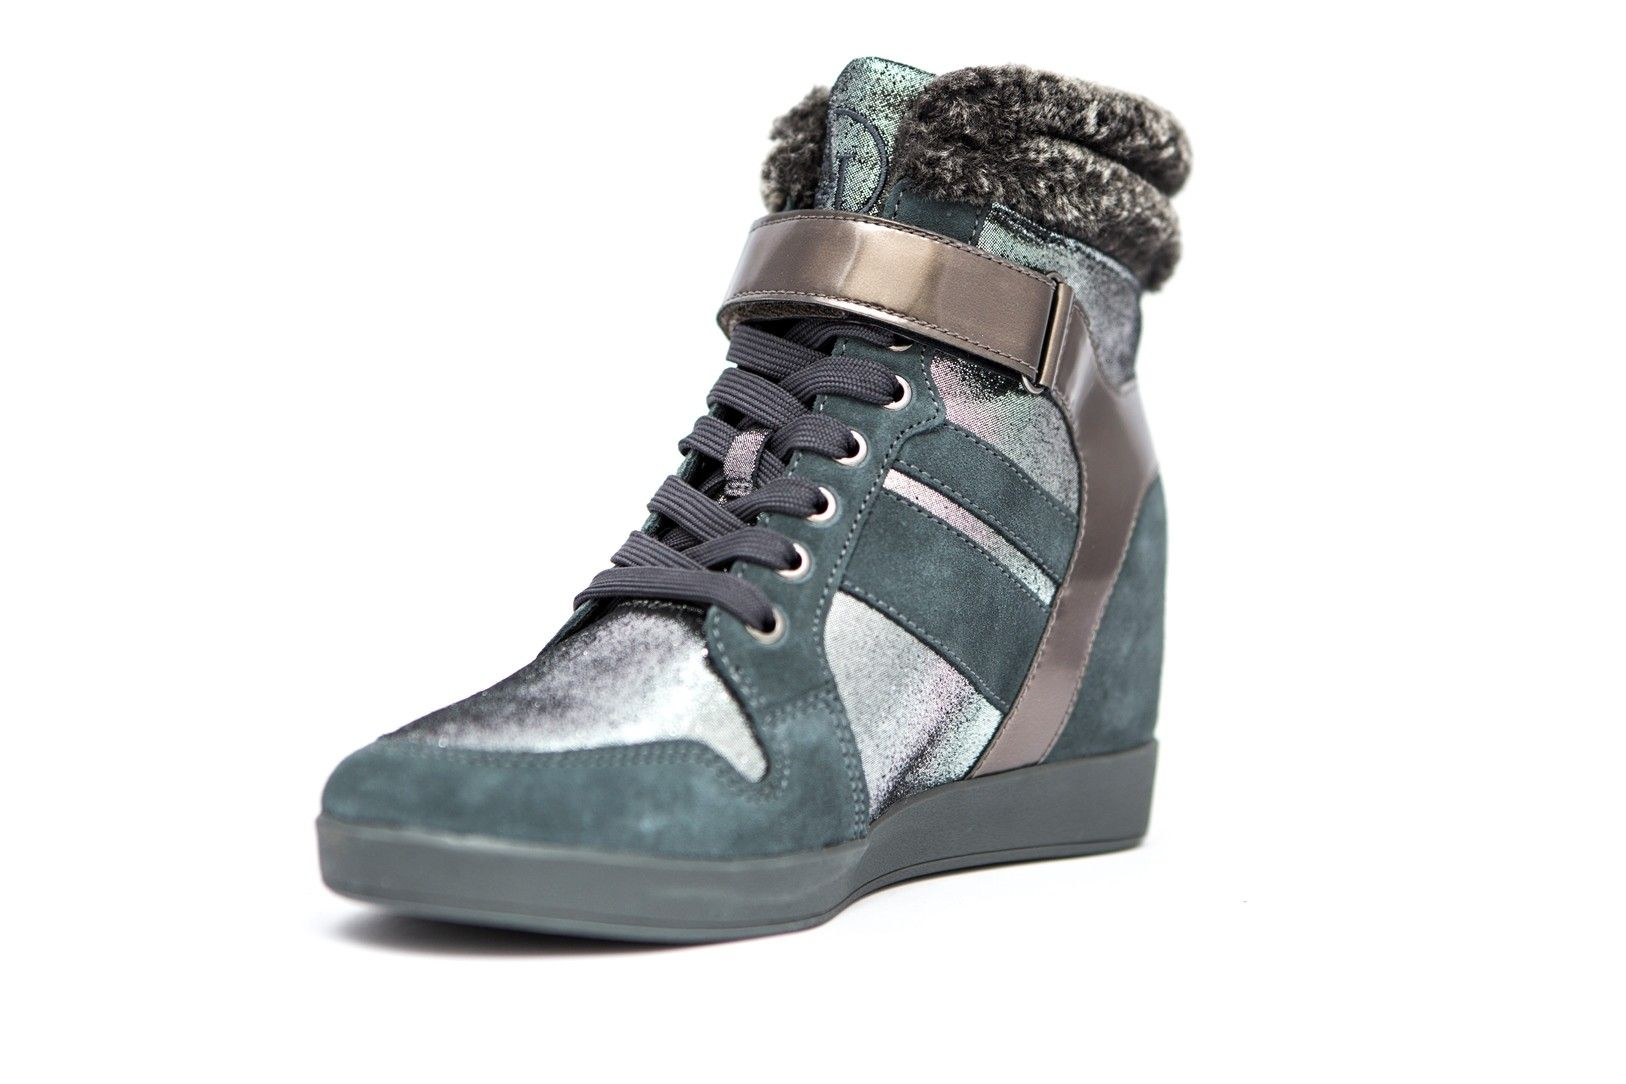 71d9e52a3a007 Armani Jeans Buty D. Sneaker Antracite 38 - 6956426802 - oficjalne ...